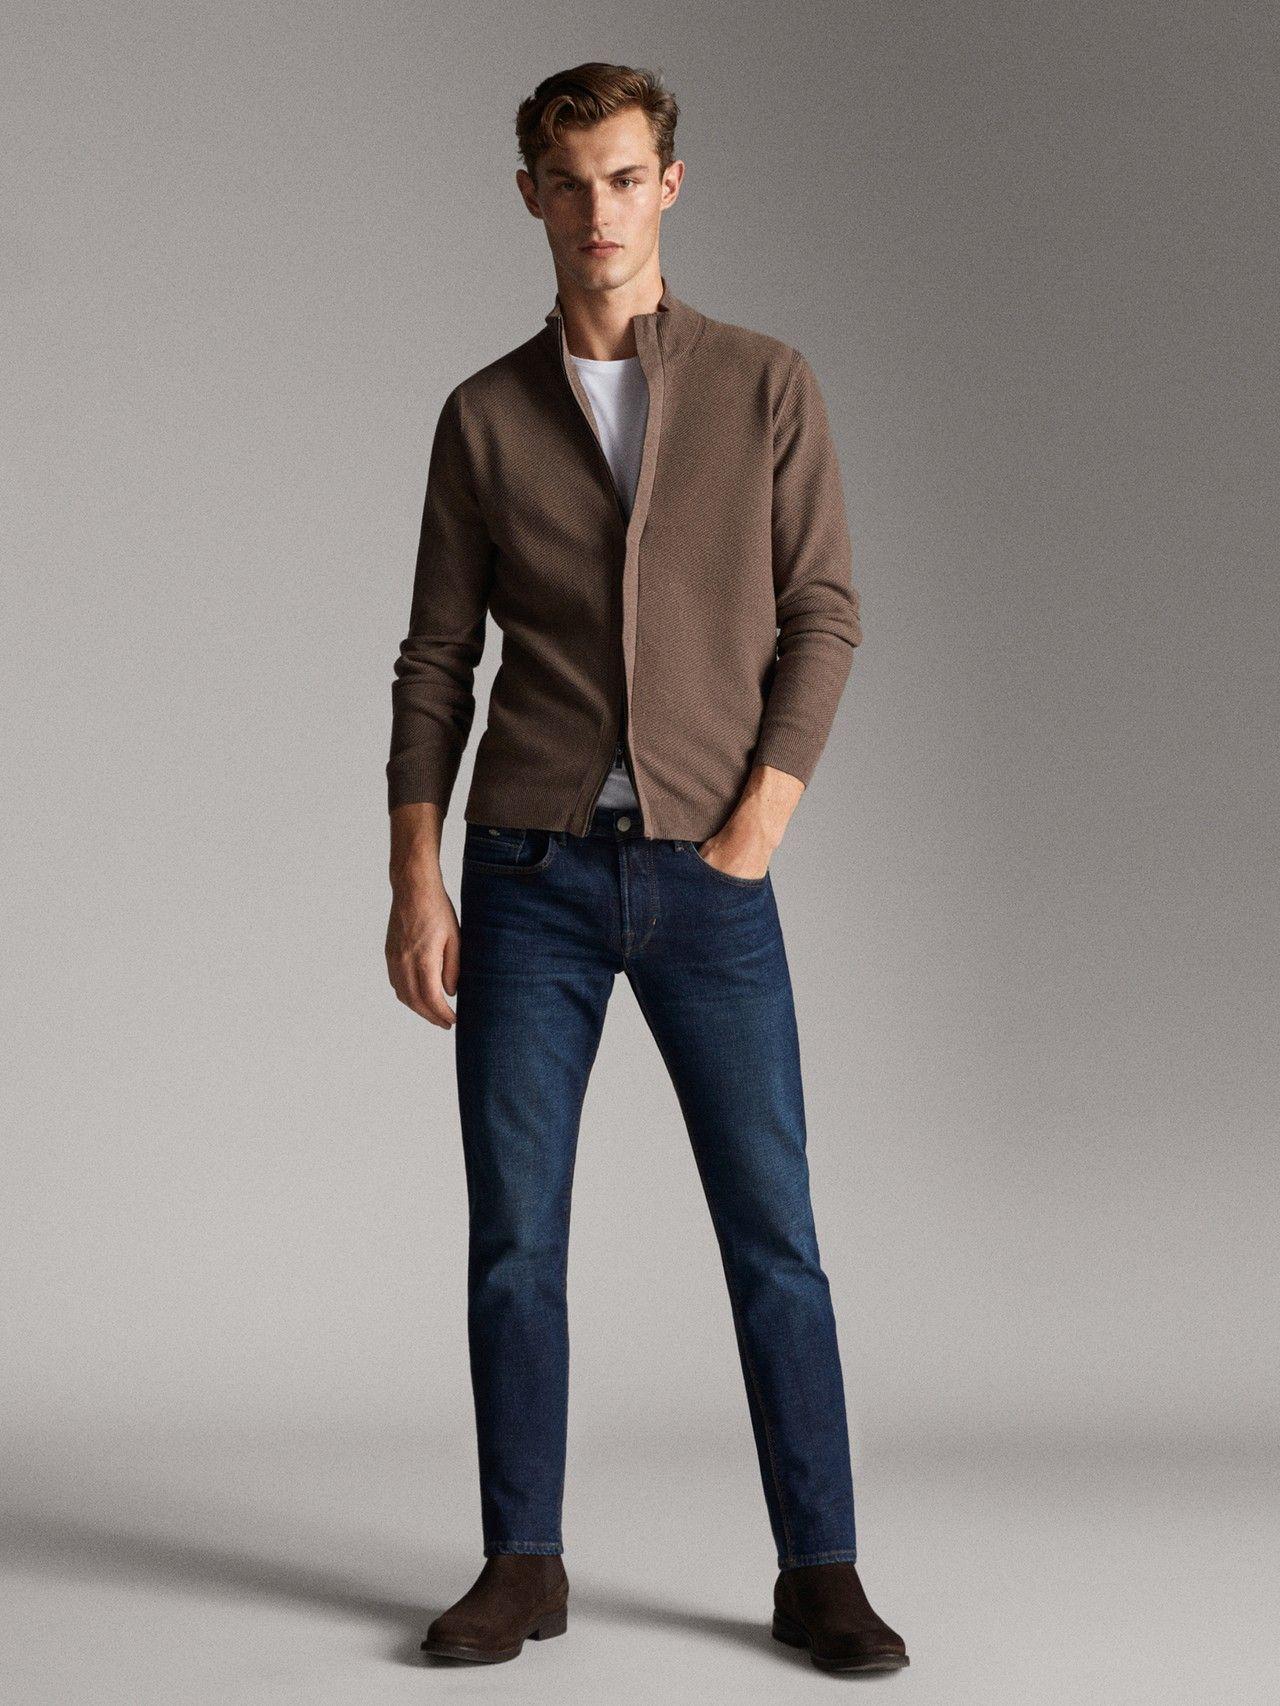 Massimo Dutti Men Zipped Cardigan Mink Xxl Smart Casual Men Mens Casual Outfits Mens Outfits